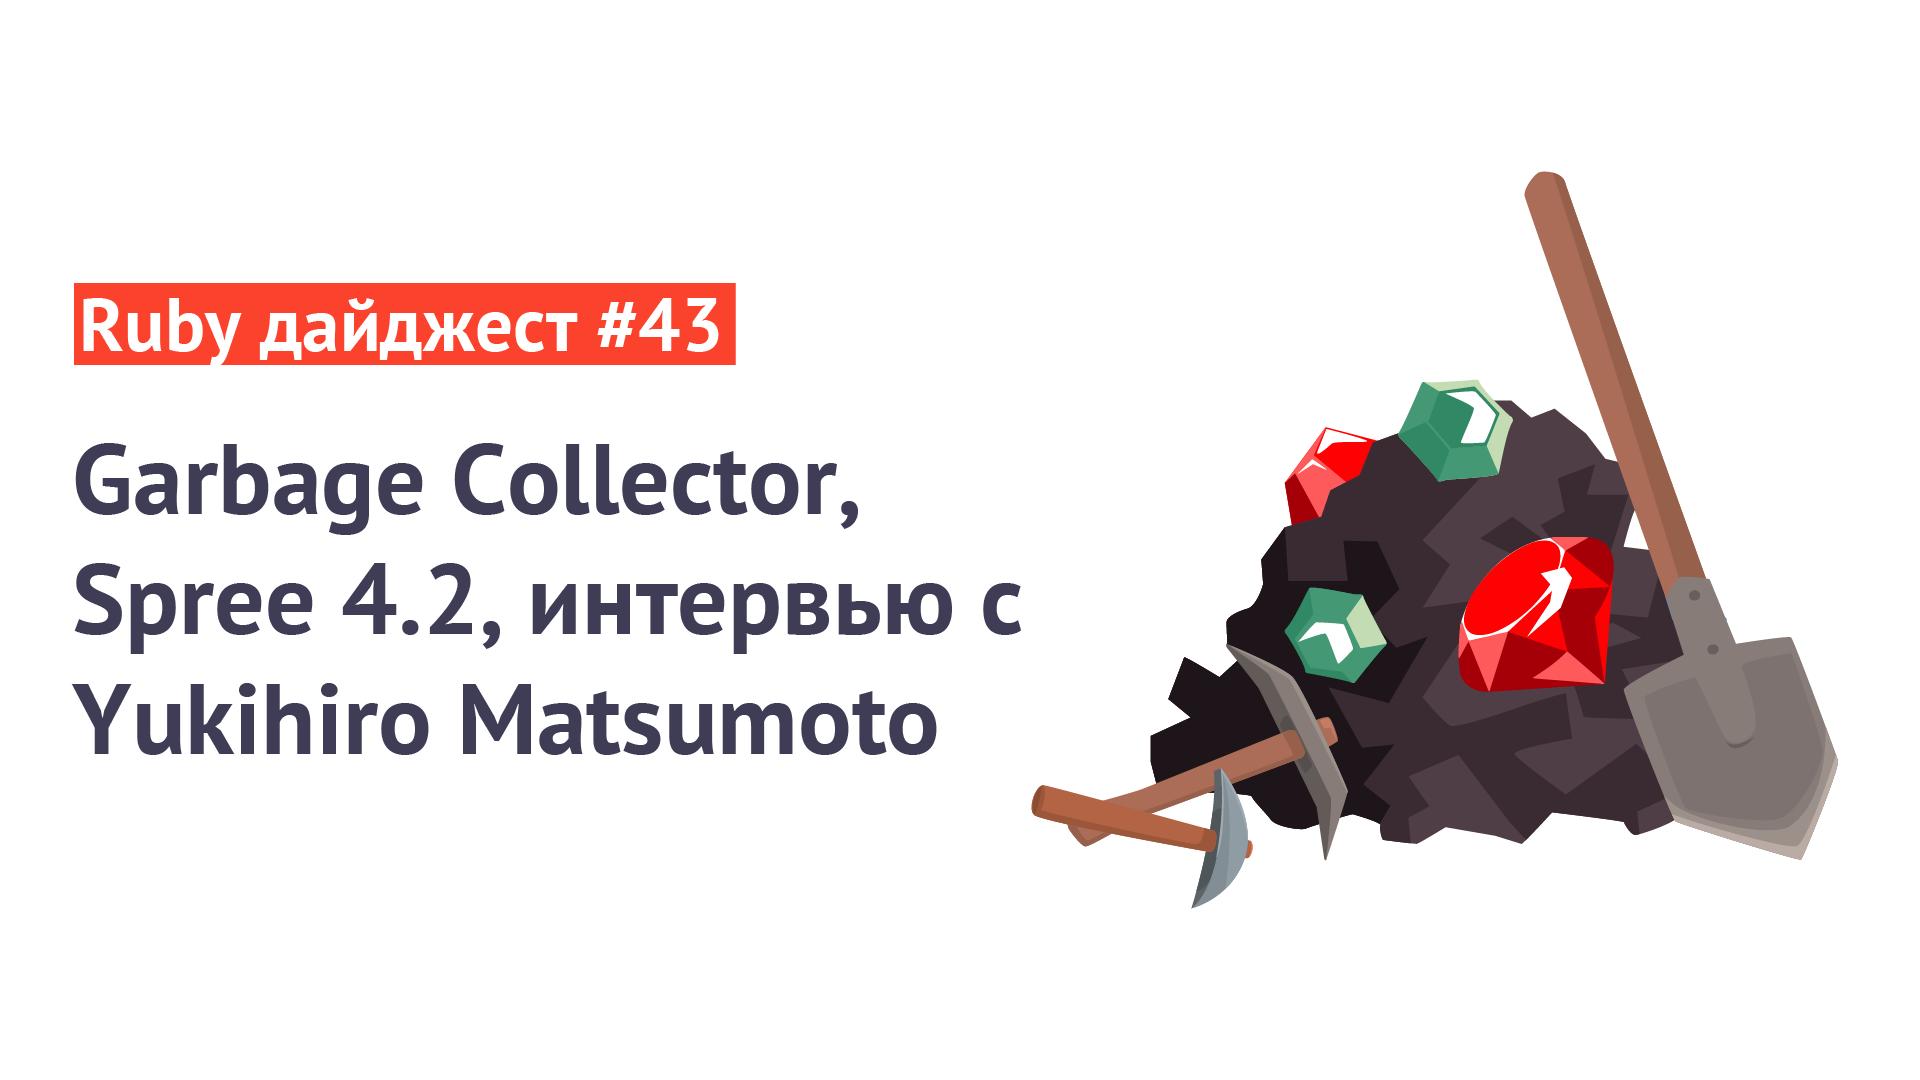 Ruby дайджест #43: Garbage Collector, Spree4.2, интервью сYukihiro Matsumoto